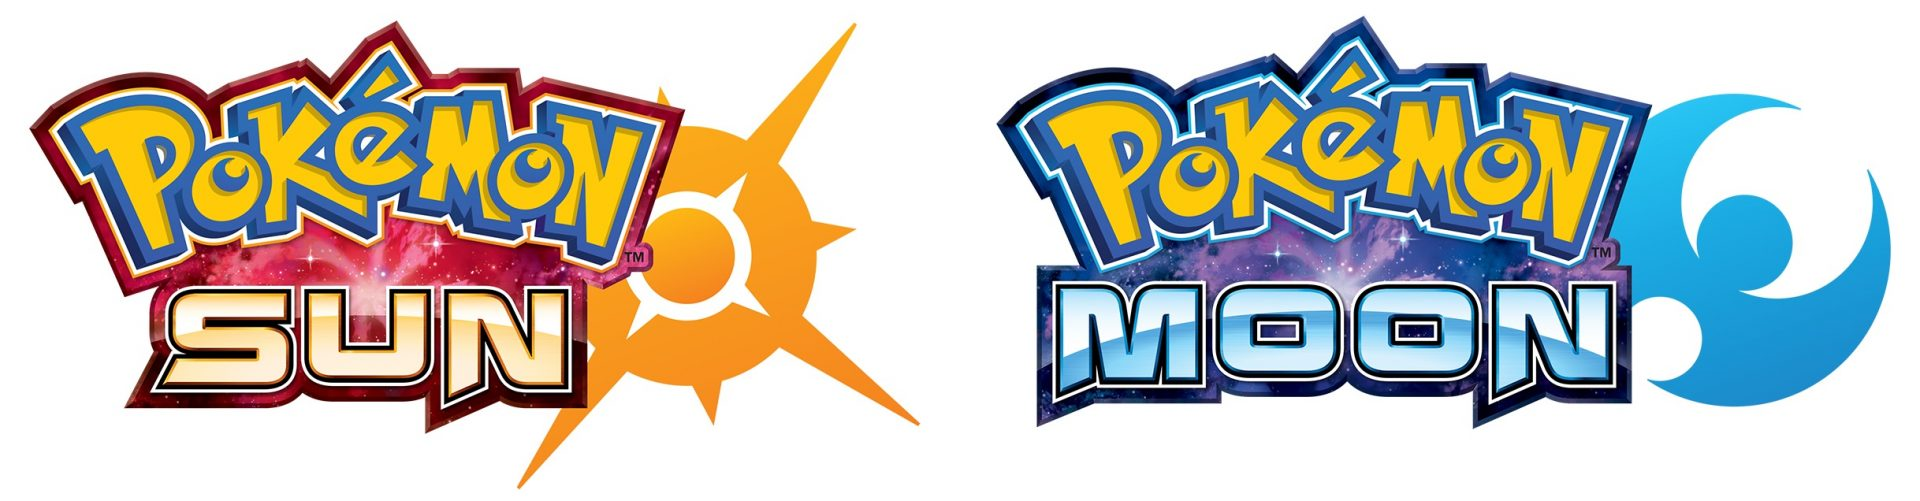 Gamescom 2016: A New Alola Region Pokémon Revealed